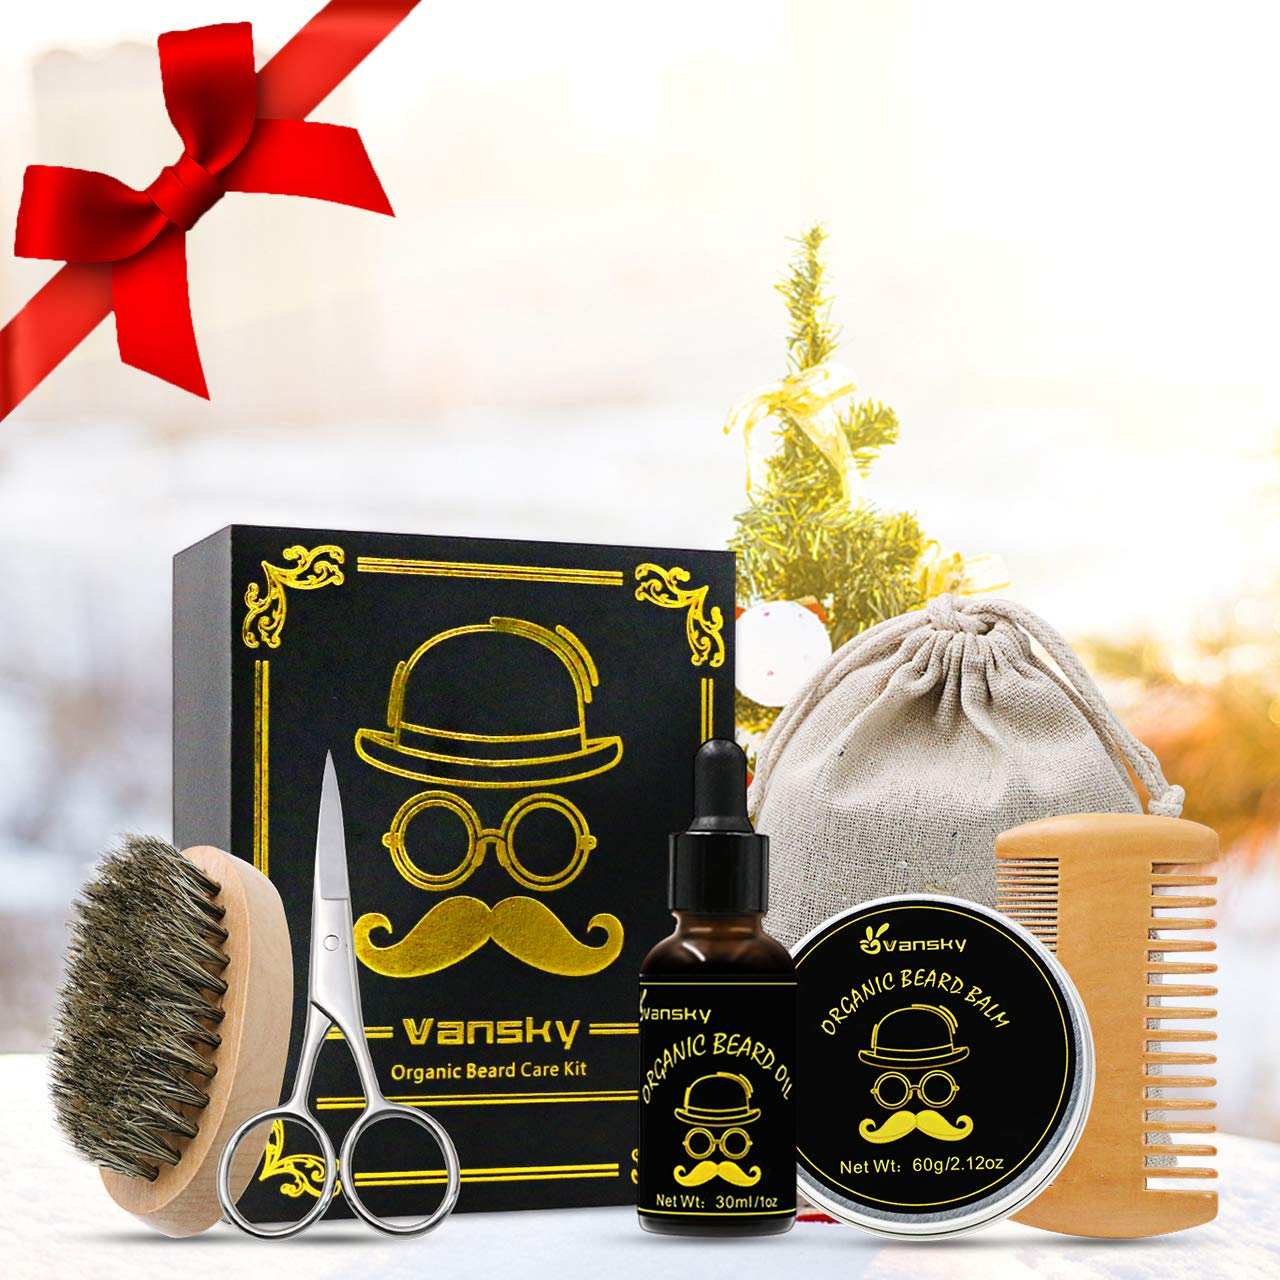 Beard Grooming Trimming Kit,Beard Growth Care Kit Including Beard Balm,Unscented Beard Oil,Mustache Brush,Beard Scissors,Beard Comb-Best Men's Gift